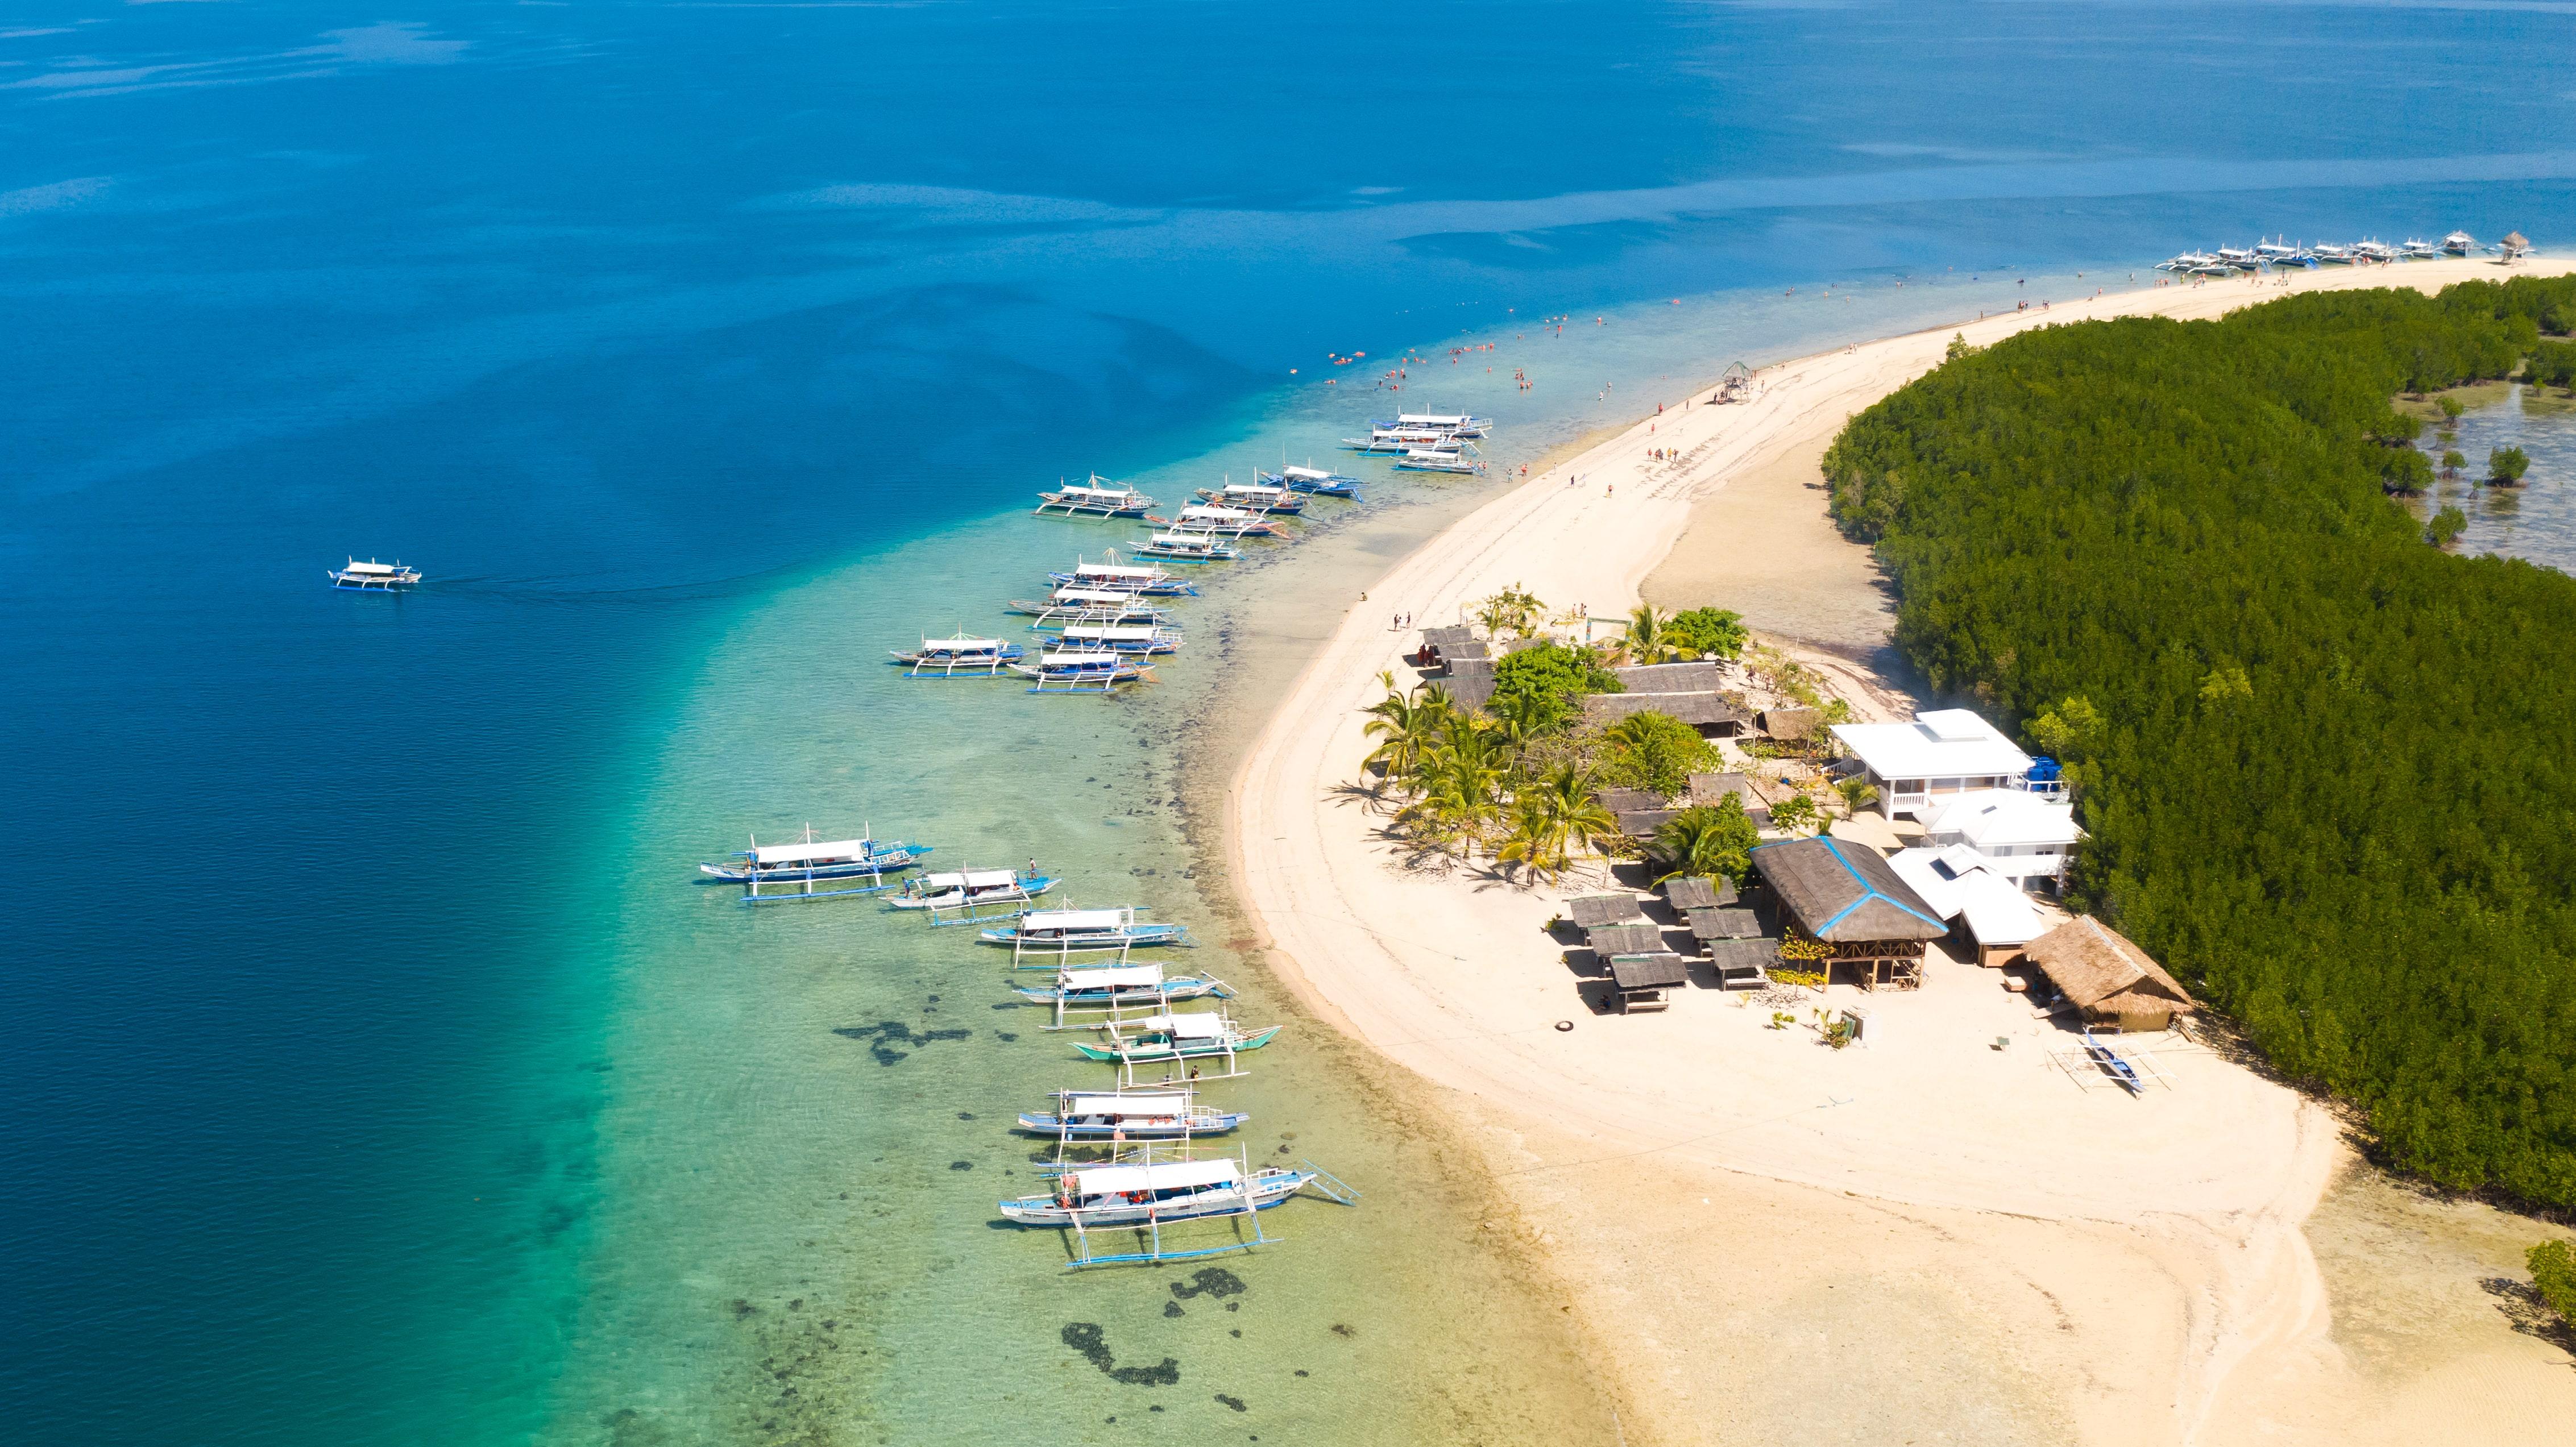 Boats in Starfish Island in Puerto Princesa